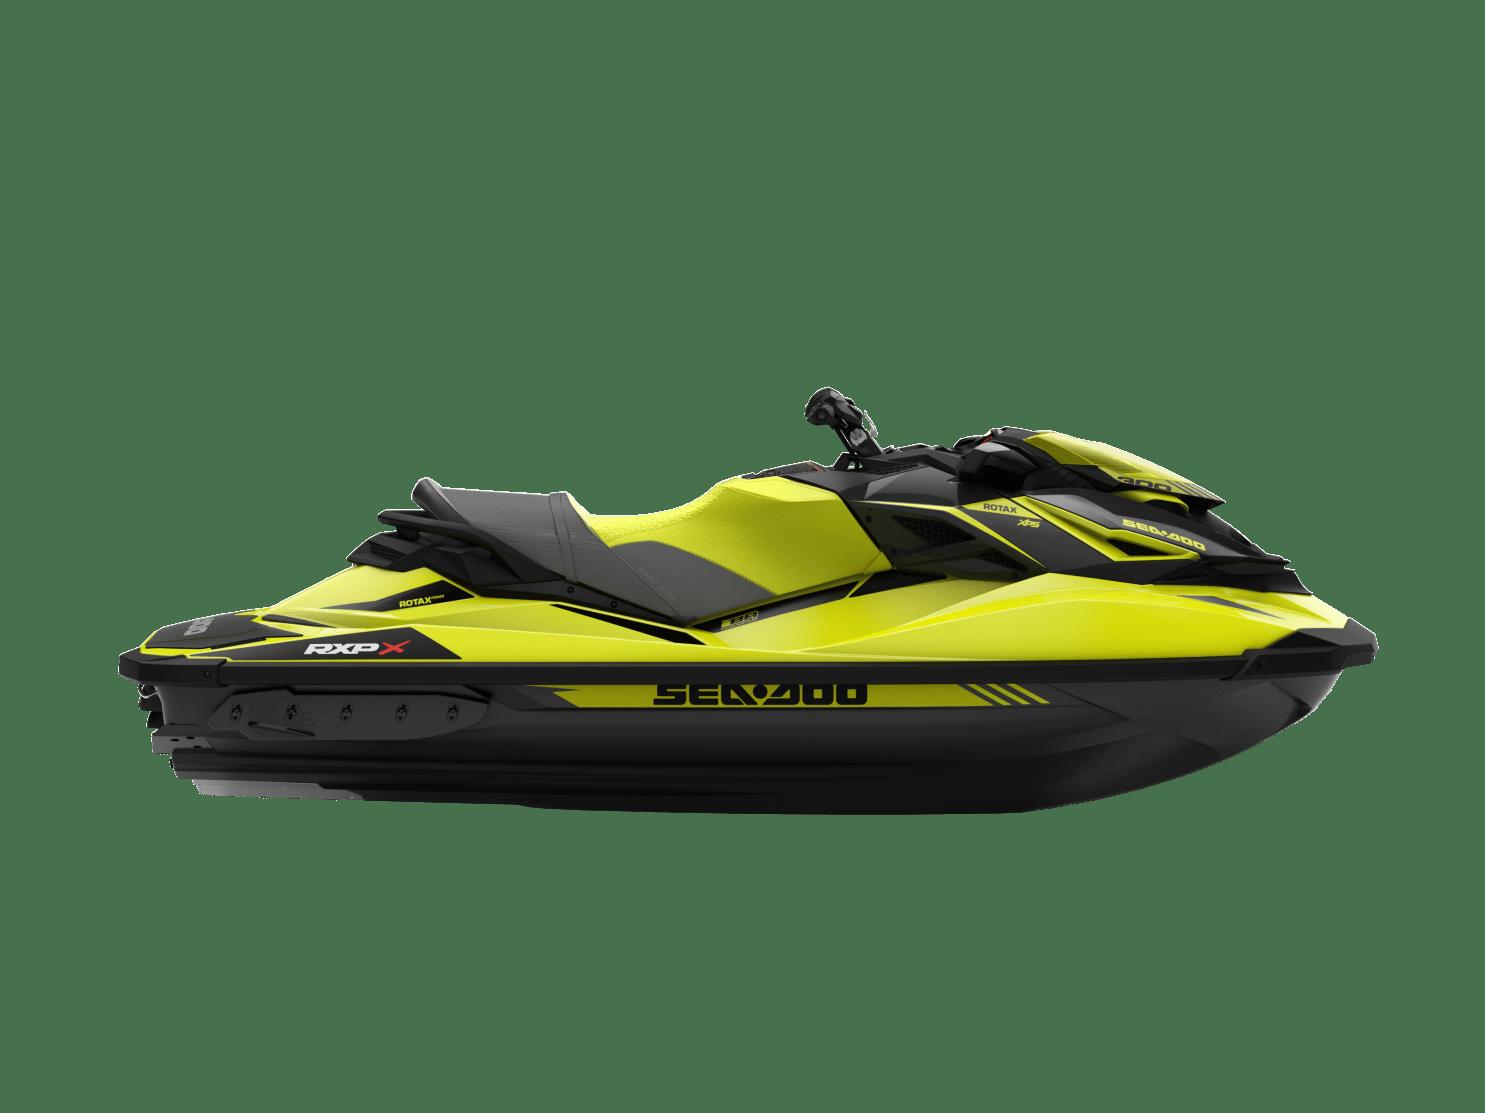 RXP-X 300 | JSW Powersports